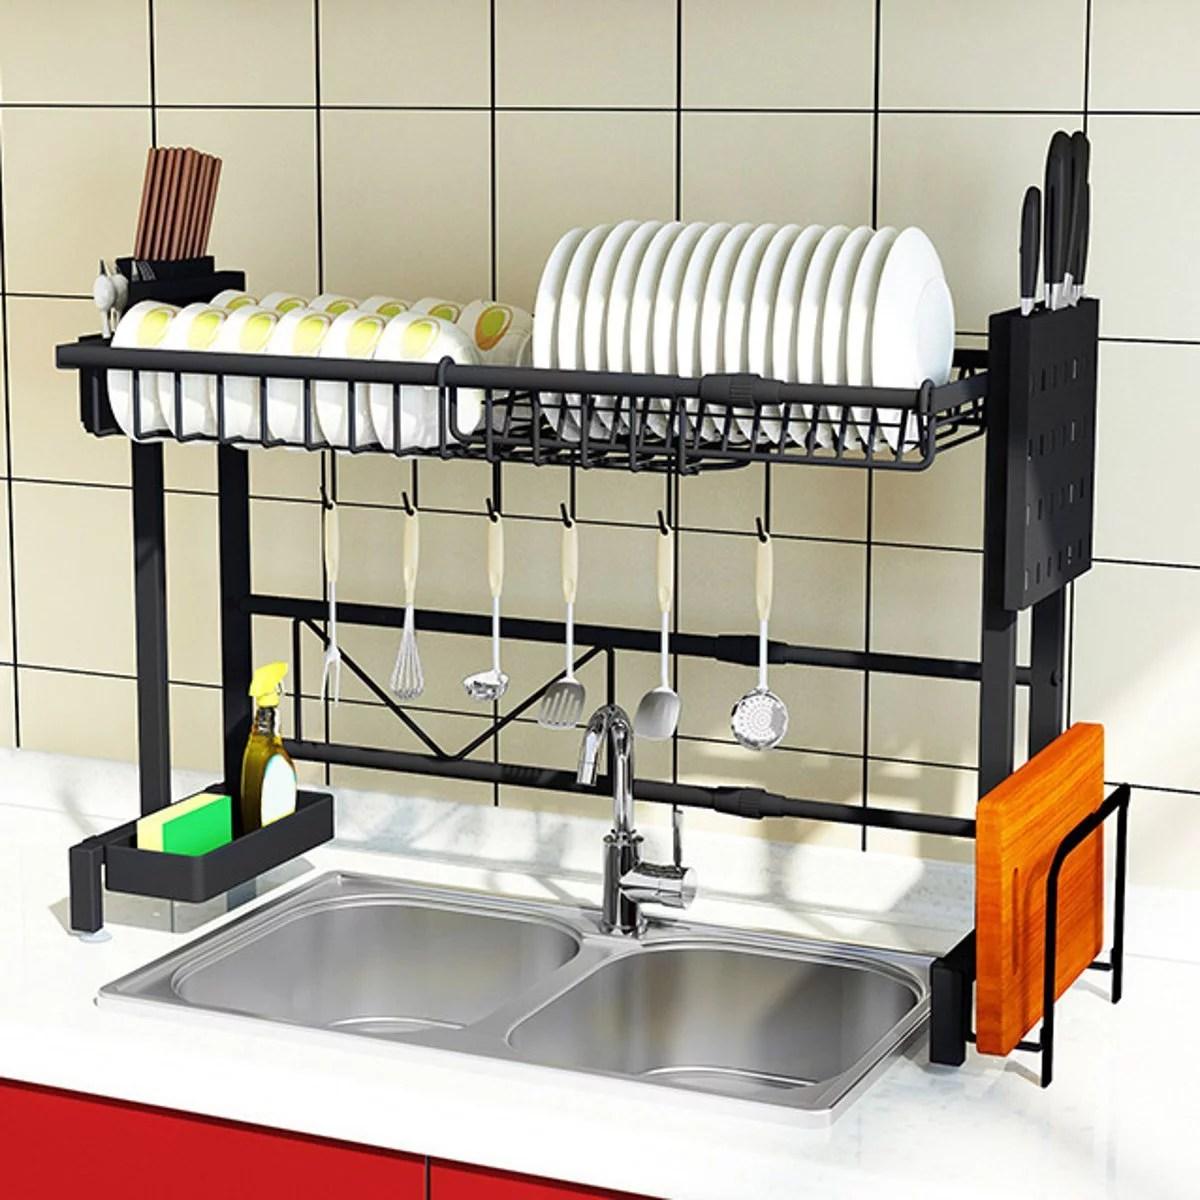 Dish Bowl Utensils Drying Rack Over Sink Drainer Kitchen Shelf For Kitchen Drying Rack Organizer Supplies Storage Counter Kitchen Space Saver Utensils Holder Stainless Steel Walmart Canada